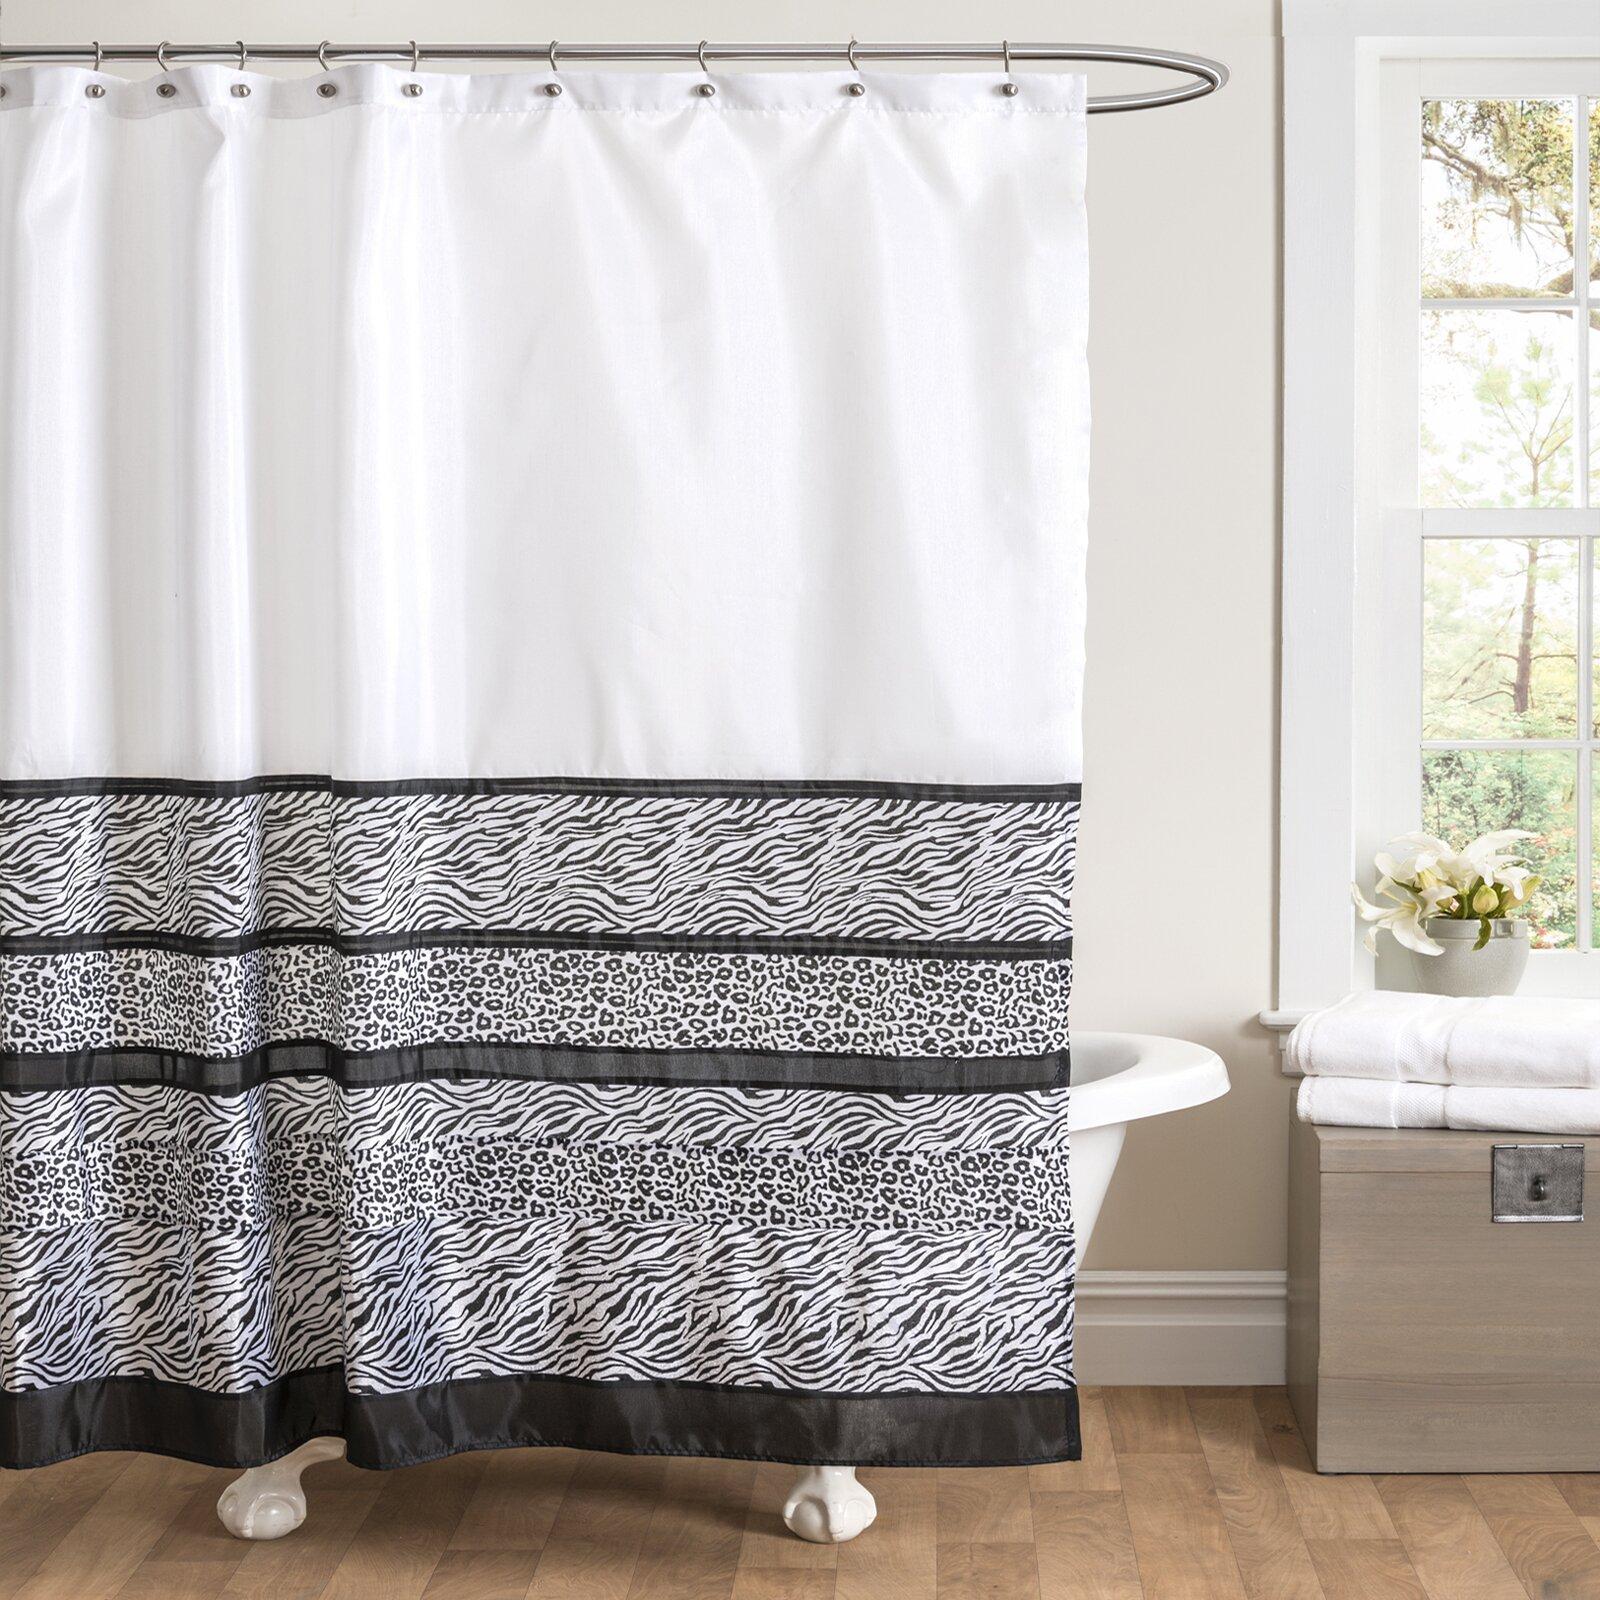 Lush Decor Tribal Dance Shower Curtain & Reviews